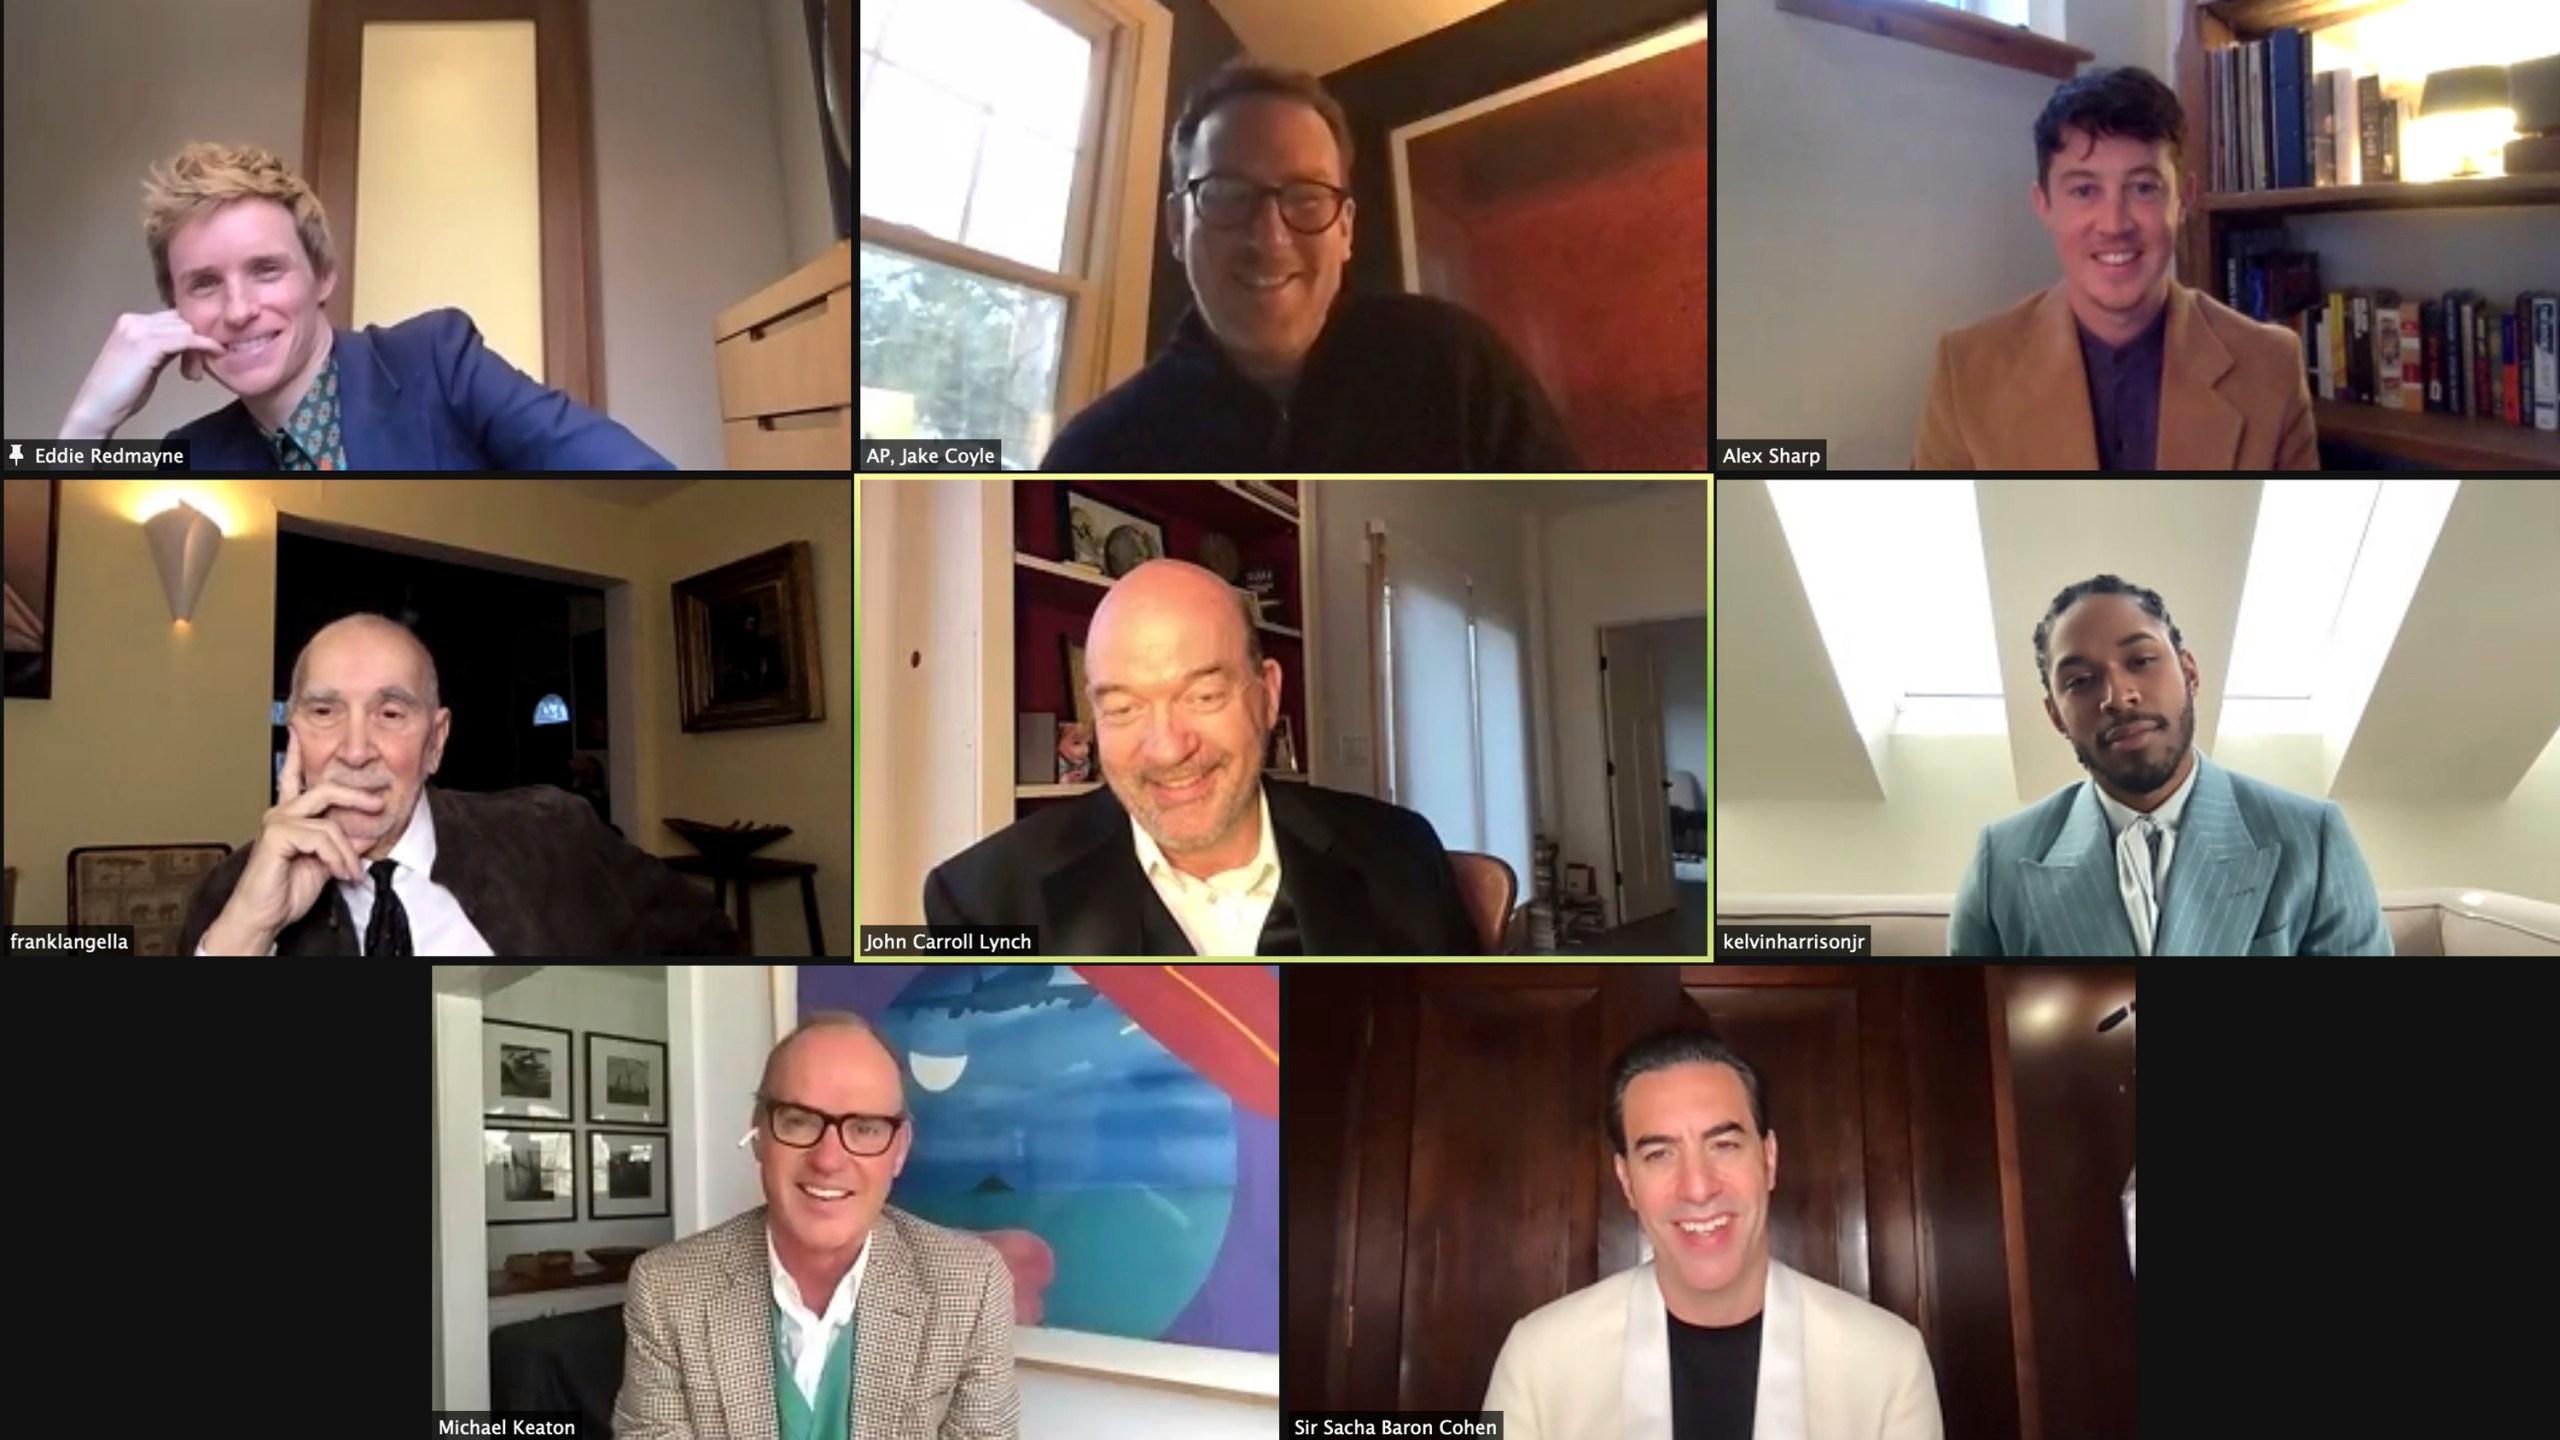 Eddie Redmayne, Alex Sharp, Frank Langella, John Carroll Lynch, Kelvin Harrison Jr., Michael Keaton, Sacha Baron Cohen